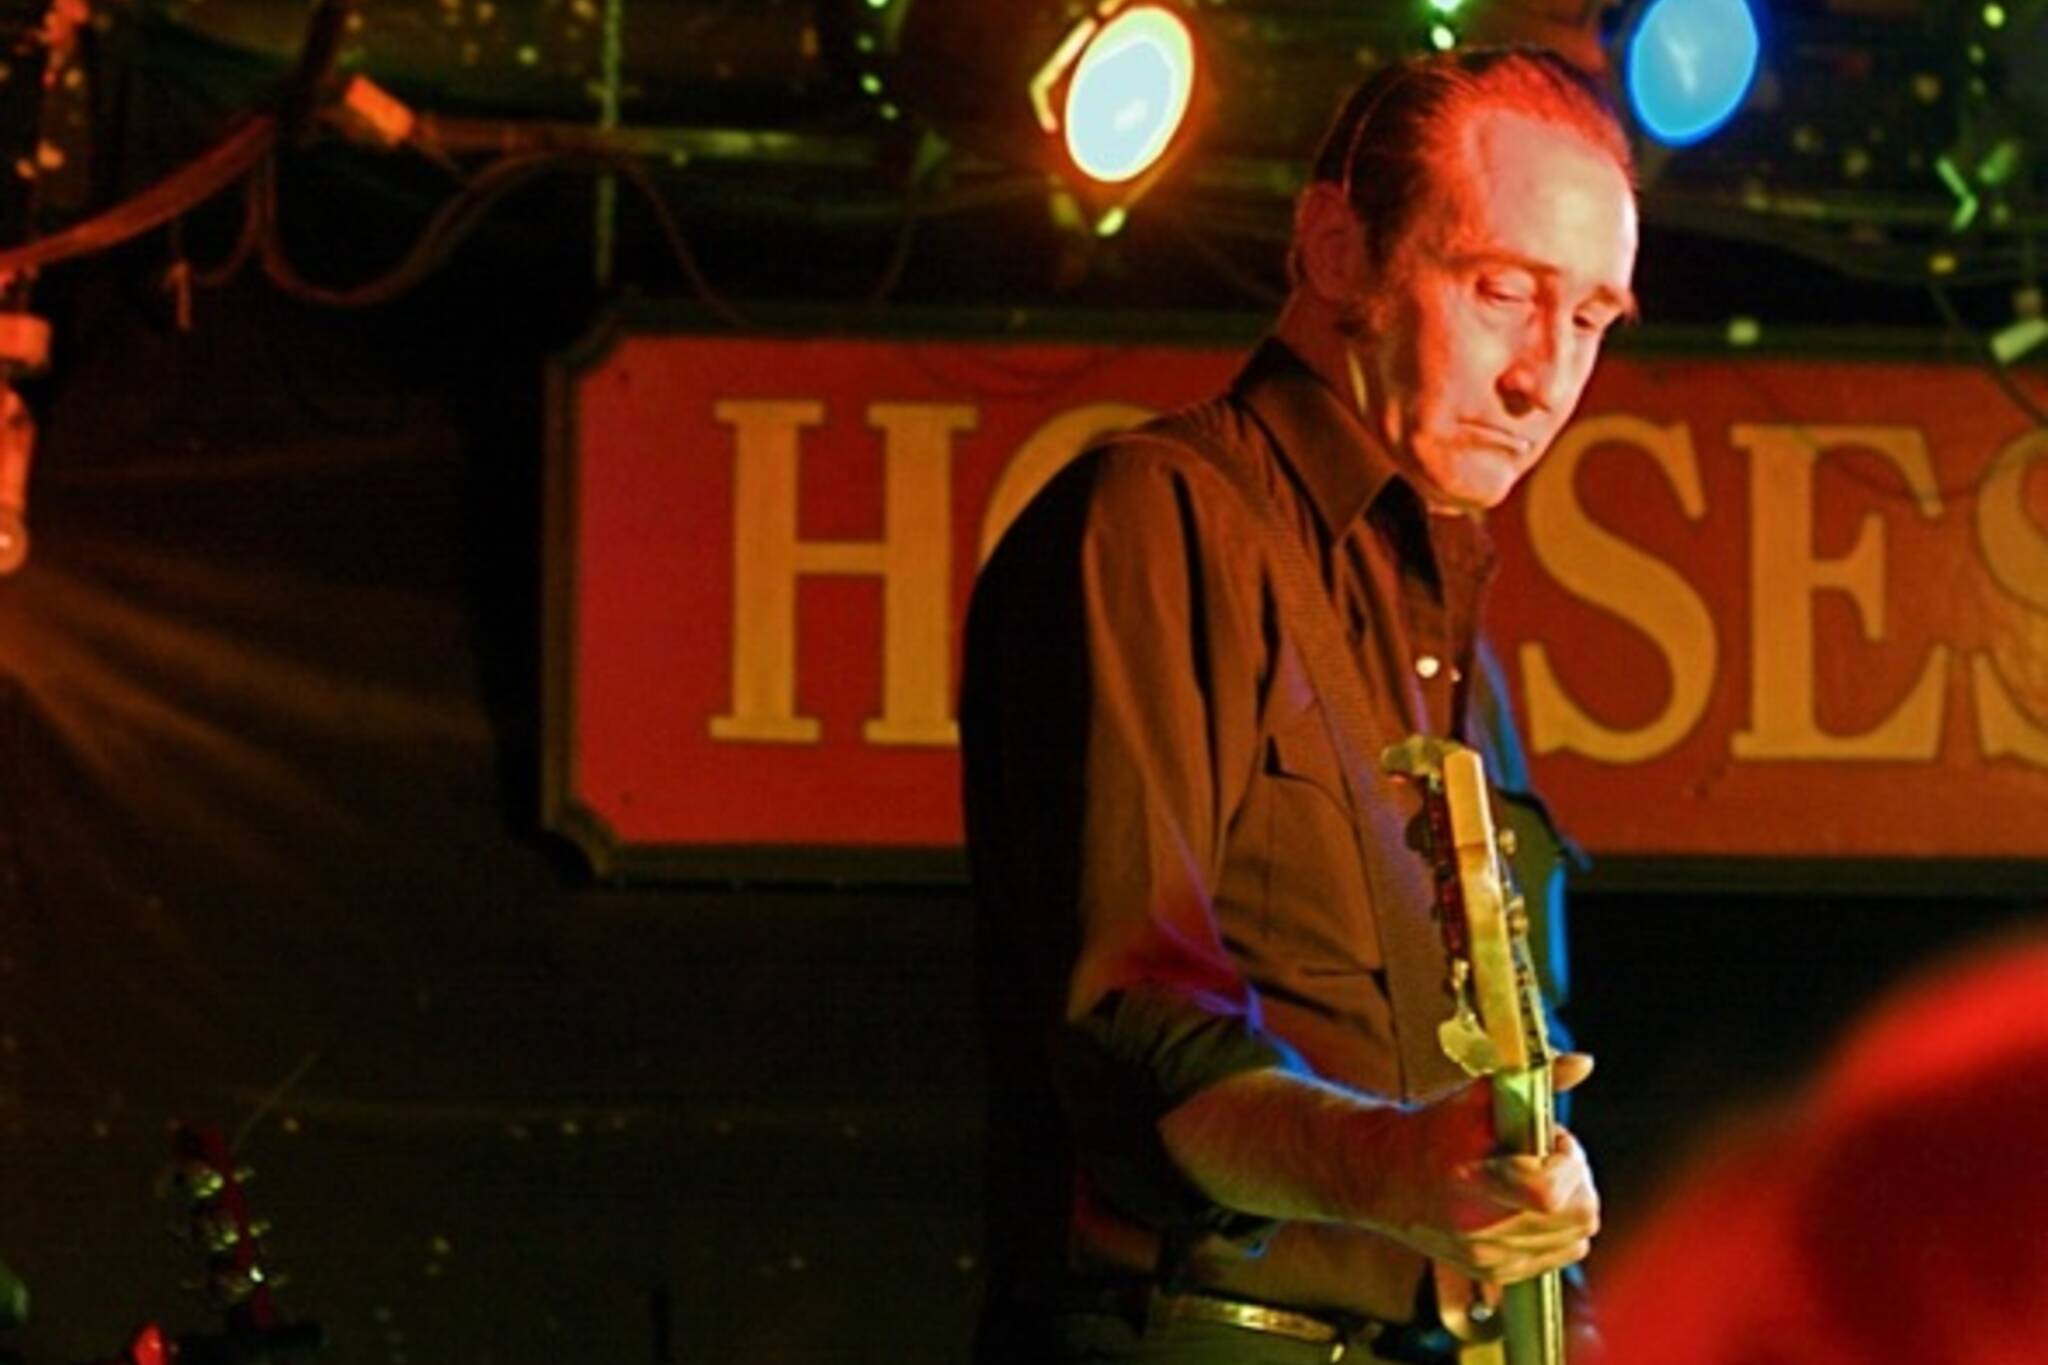 Reigning Sound at the Horseshoe Tavern